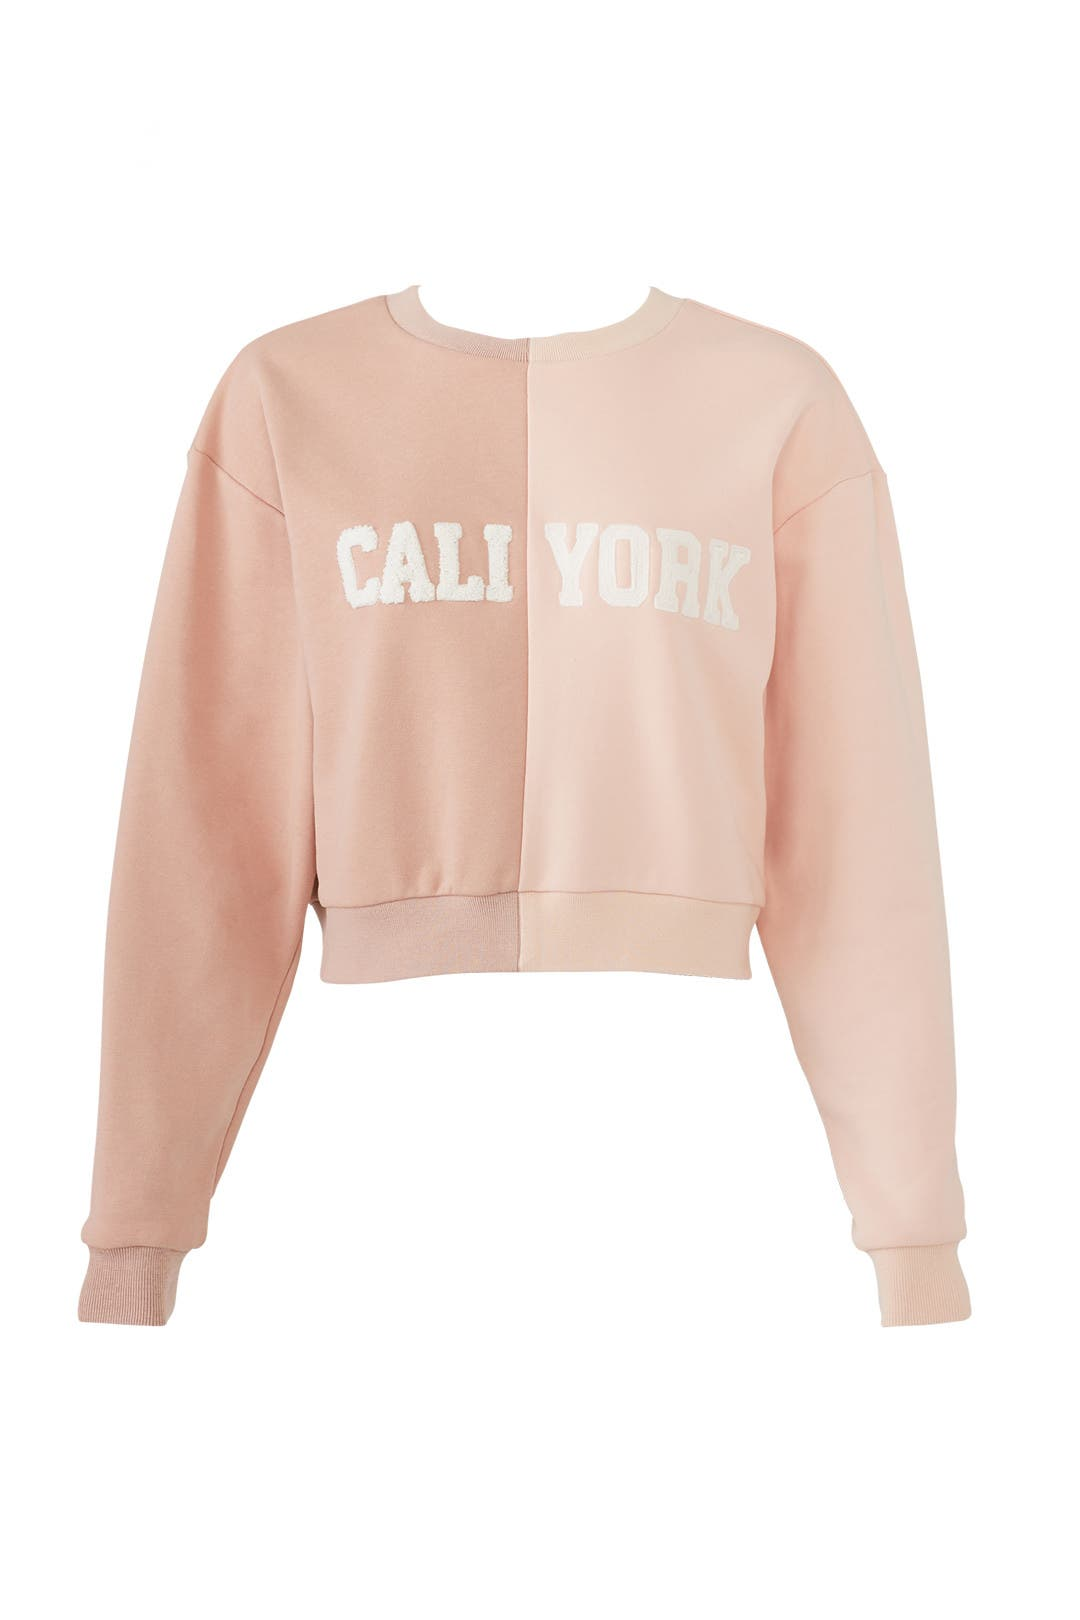 57ae2456f19ff4 Pink CaliYork Sweatshirt by Cynthia Rowley for $30 | Rent the Runway